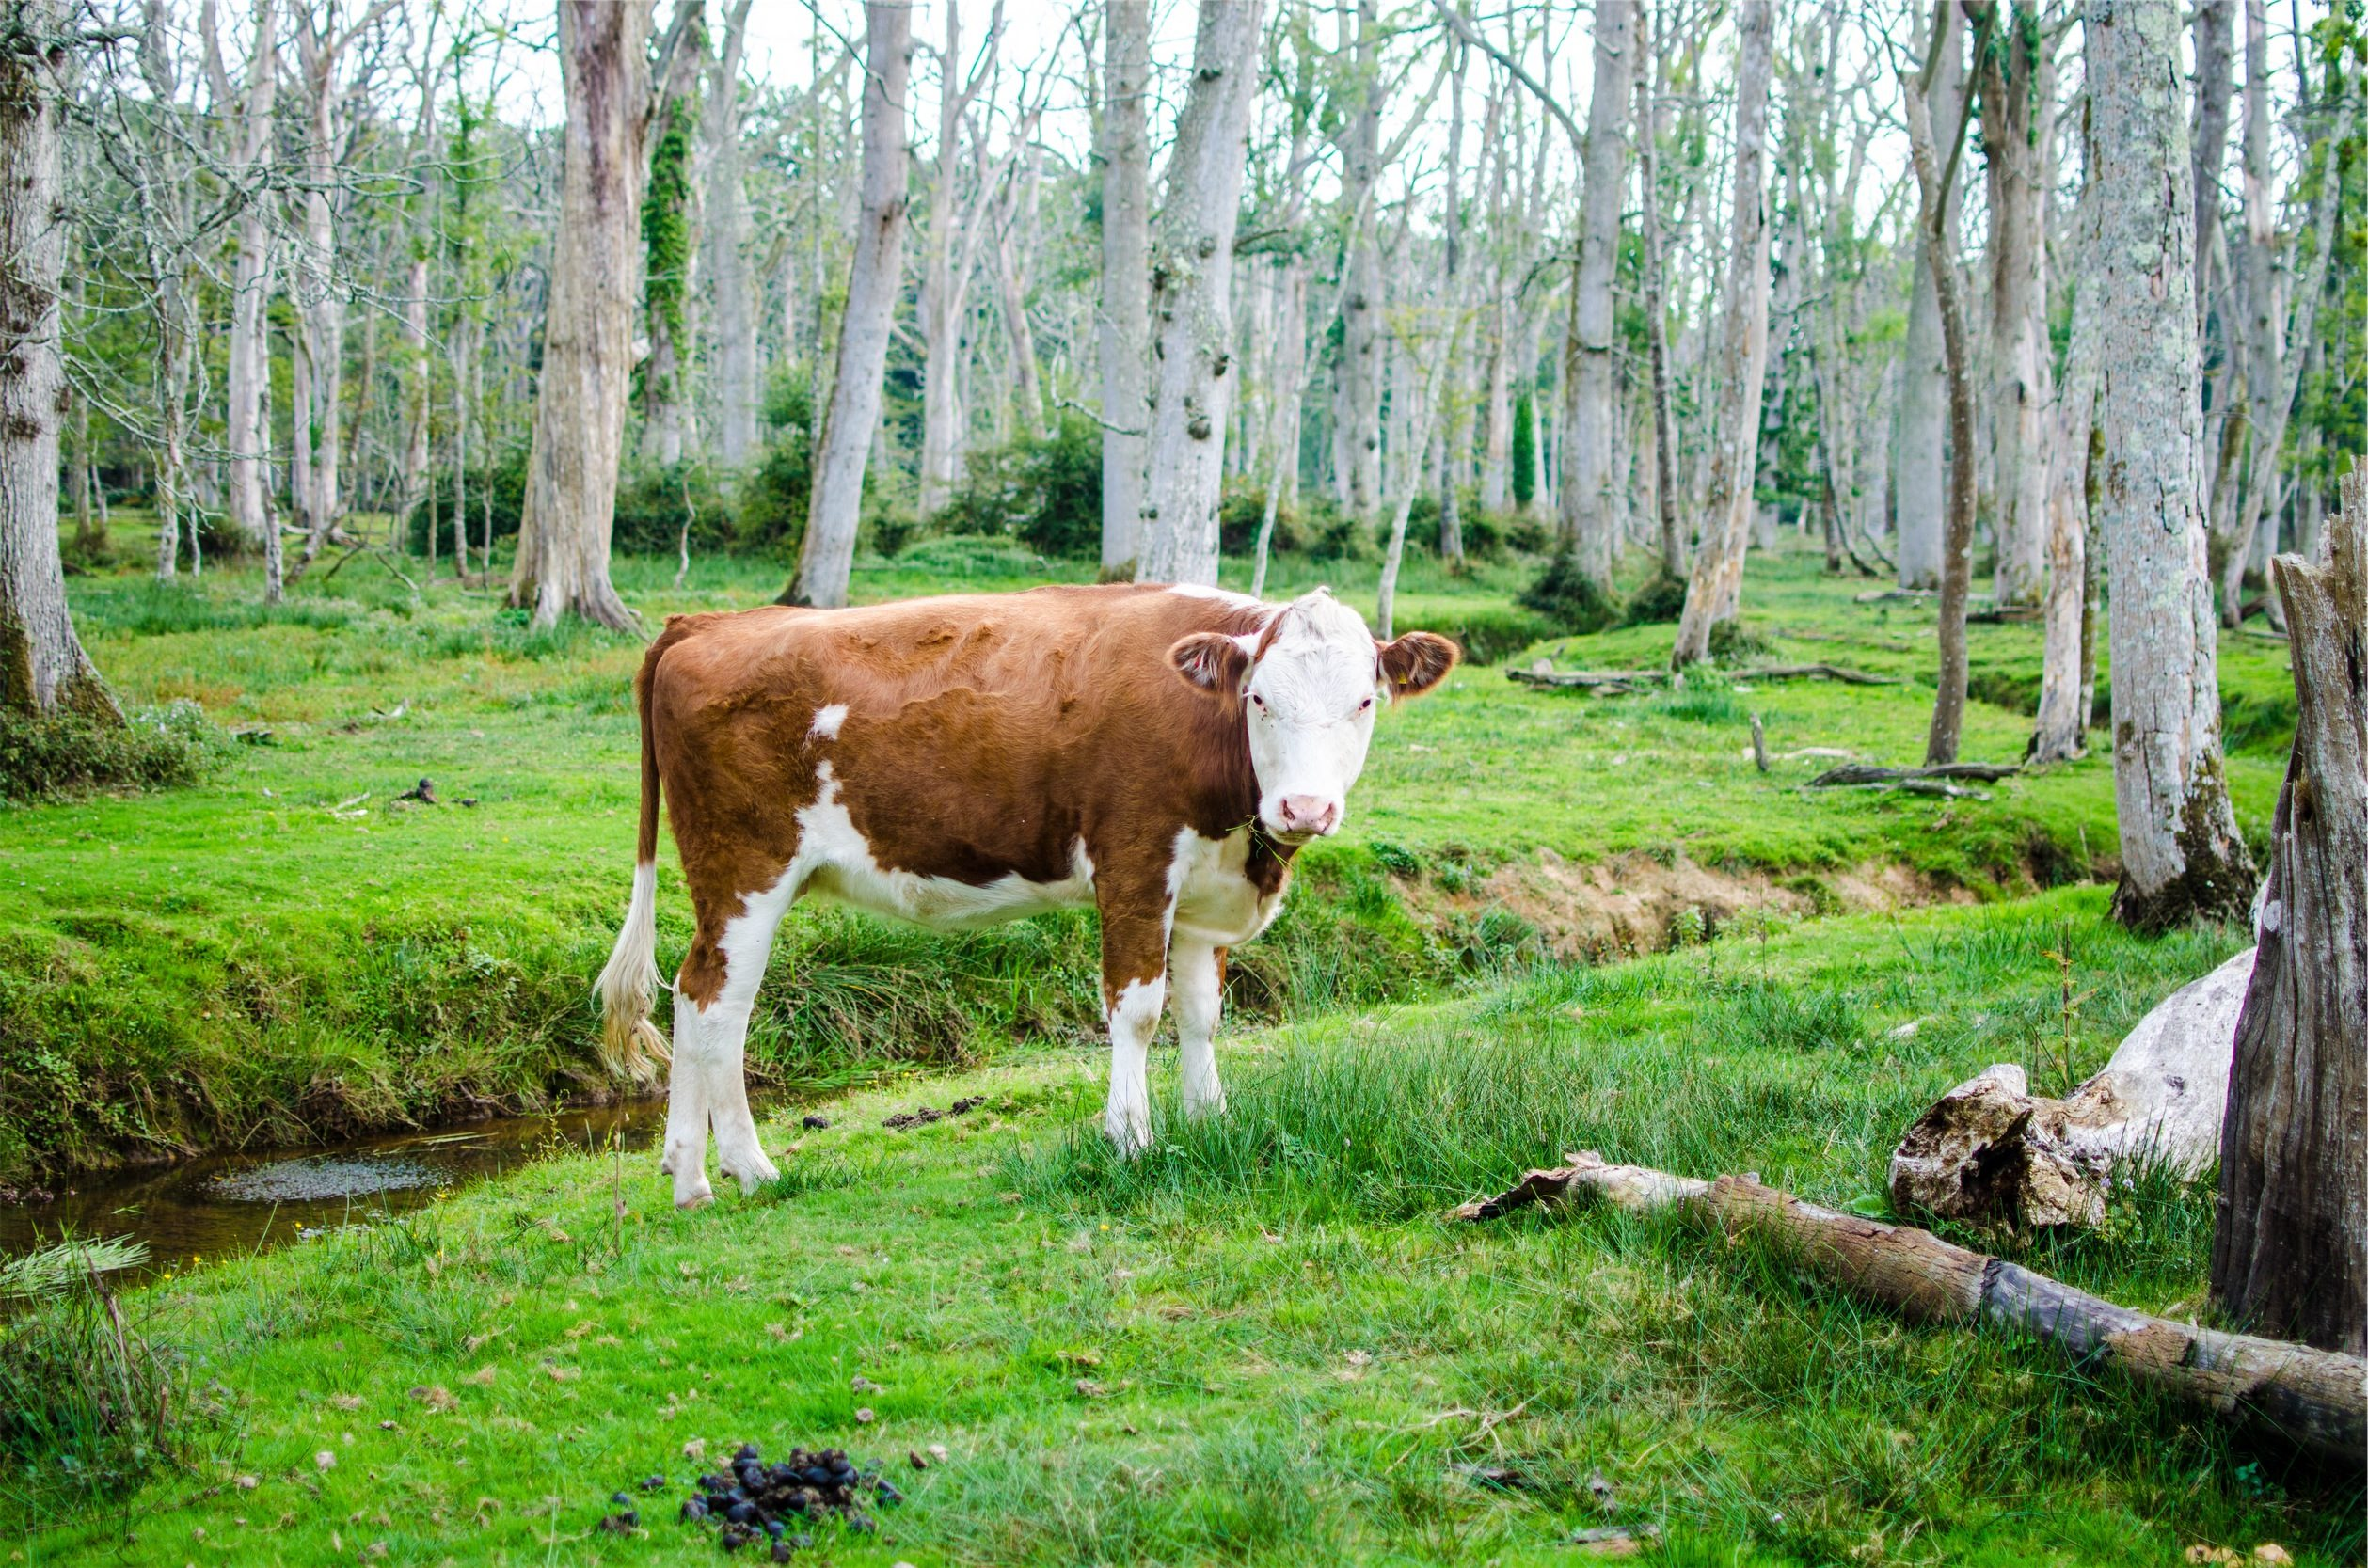 vaca, ternera, वन, देखो, árboles - HD वॉलपेपर - प्रोफेसर-falken.com